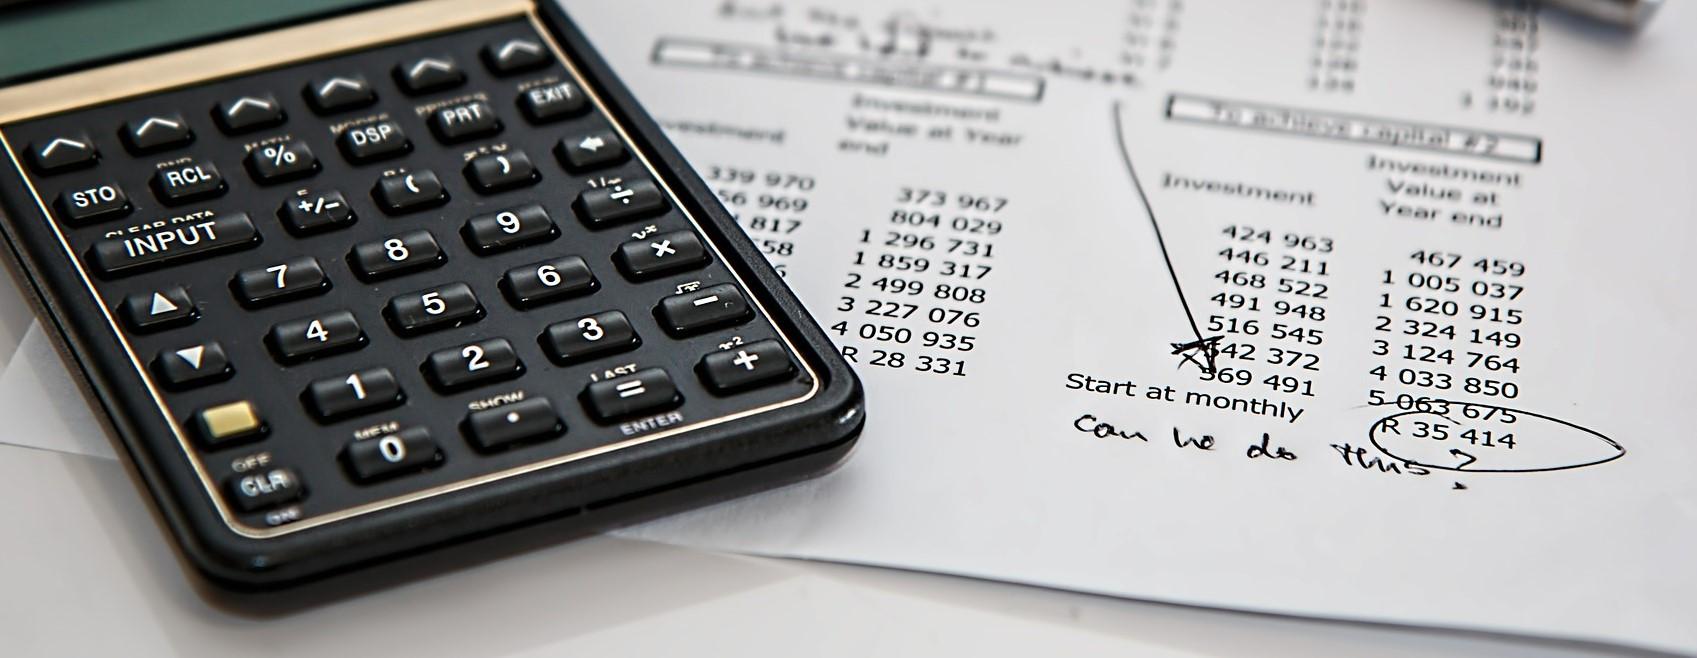 cheap or affordable seo calculator